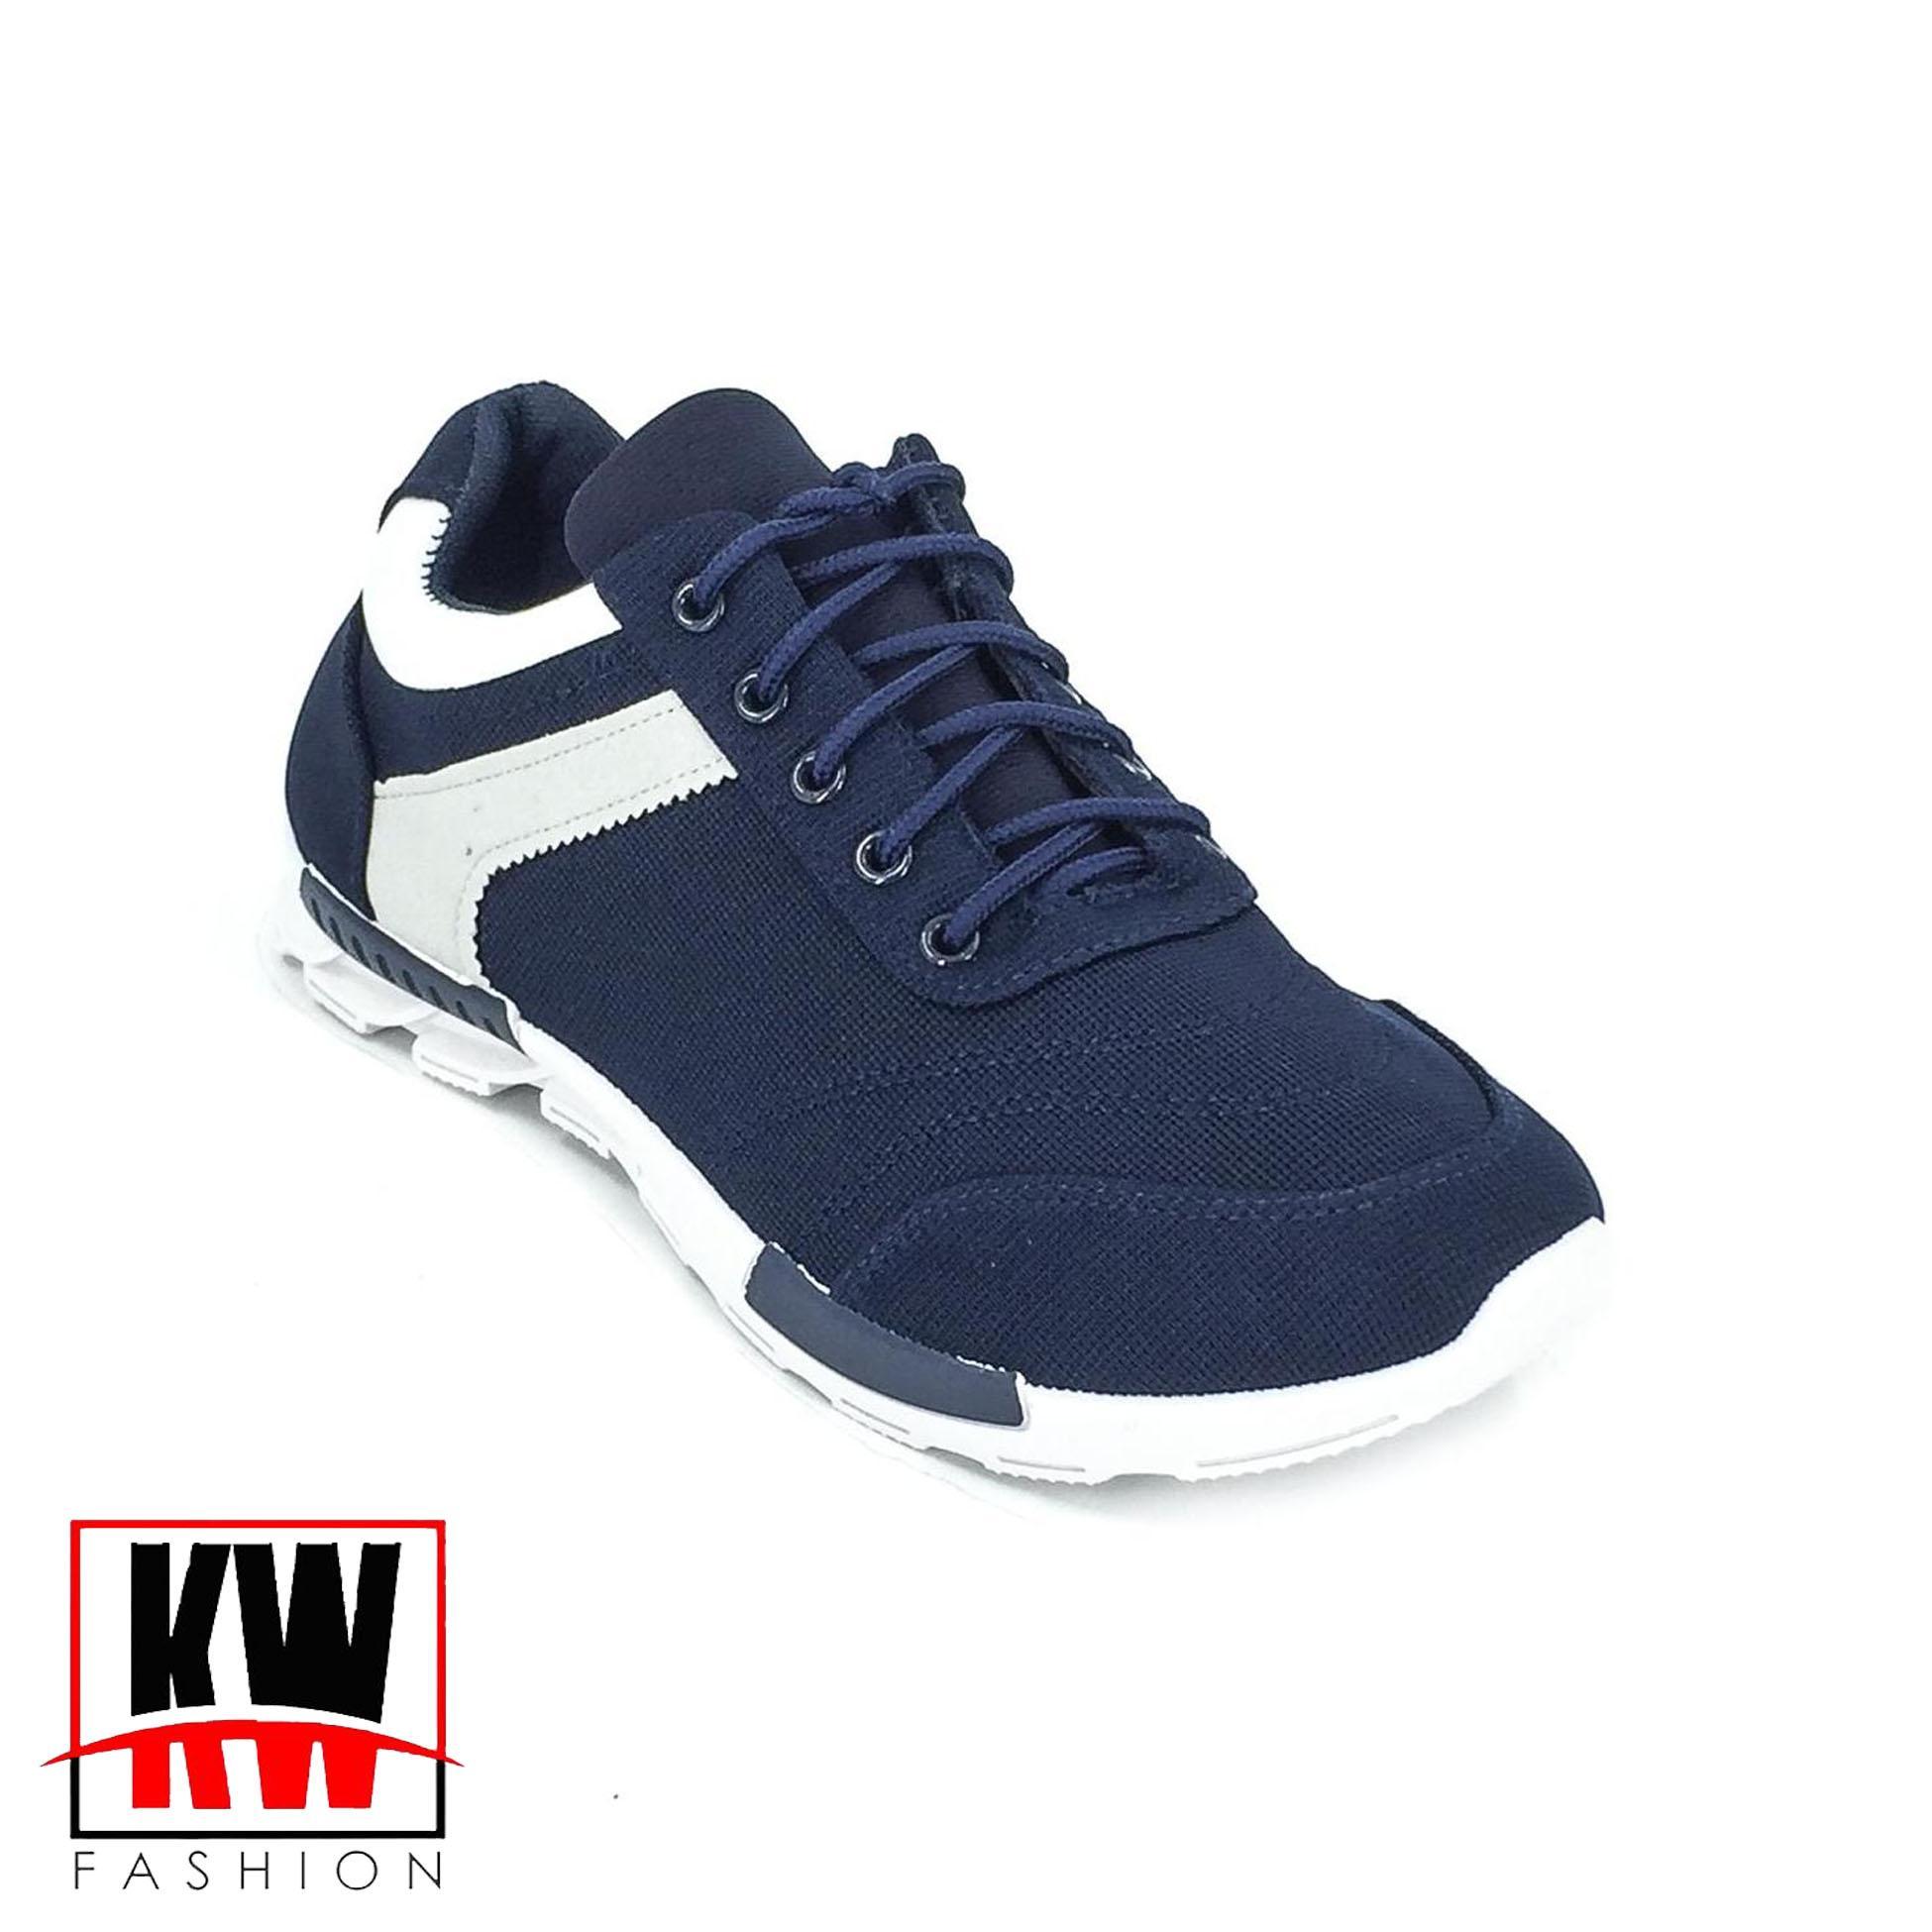 f740677a1 Shoes for Men for sale - Mens Fashion Shoes online brands